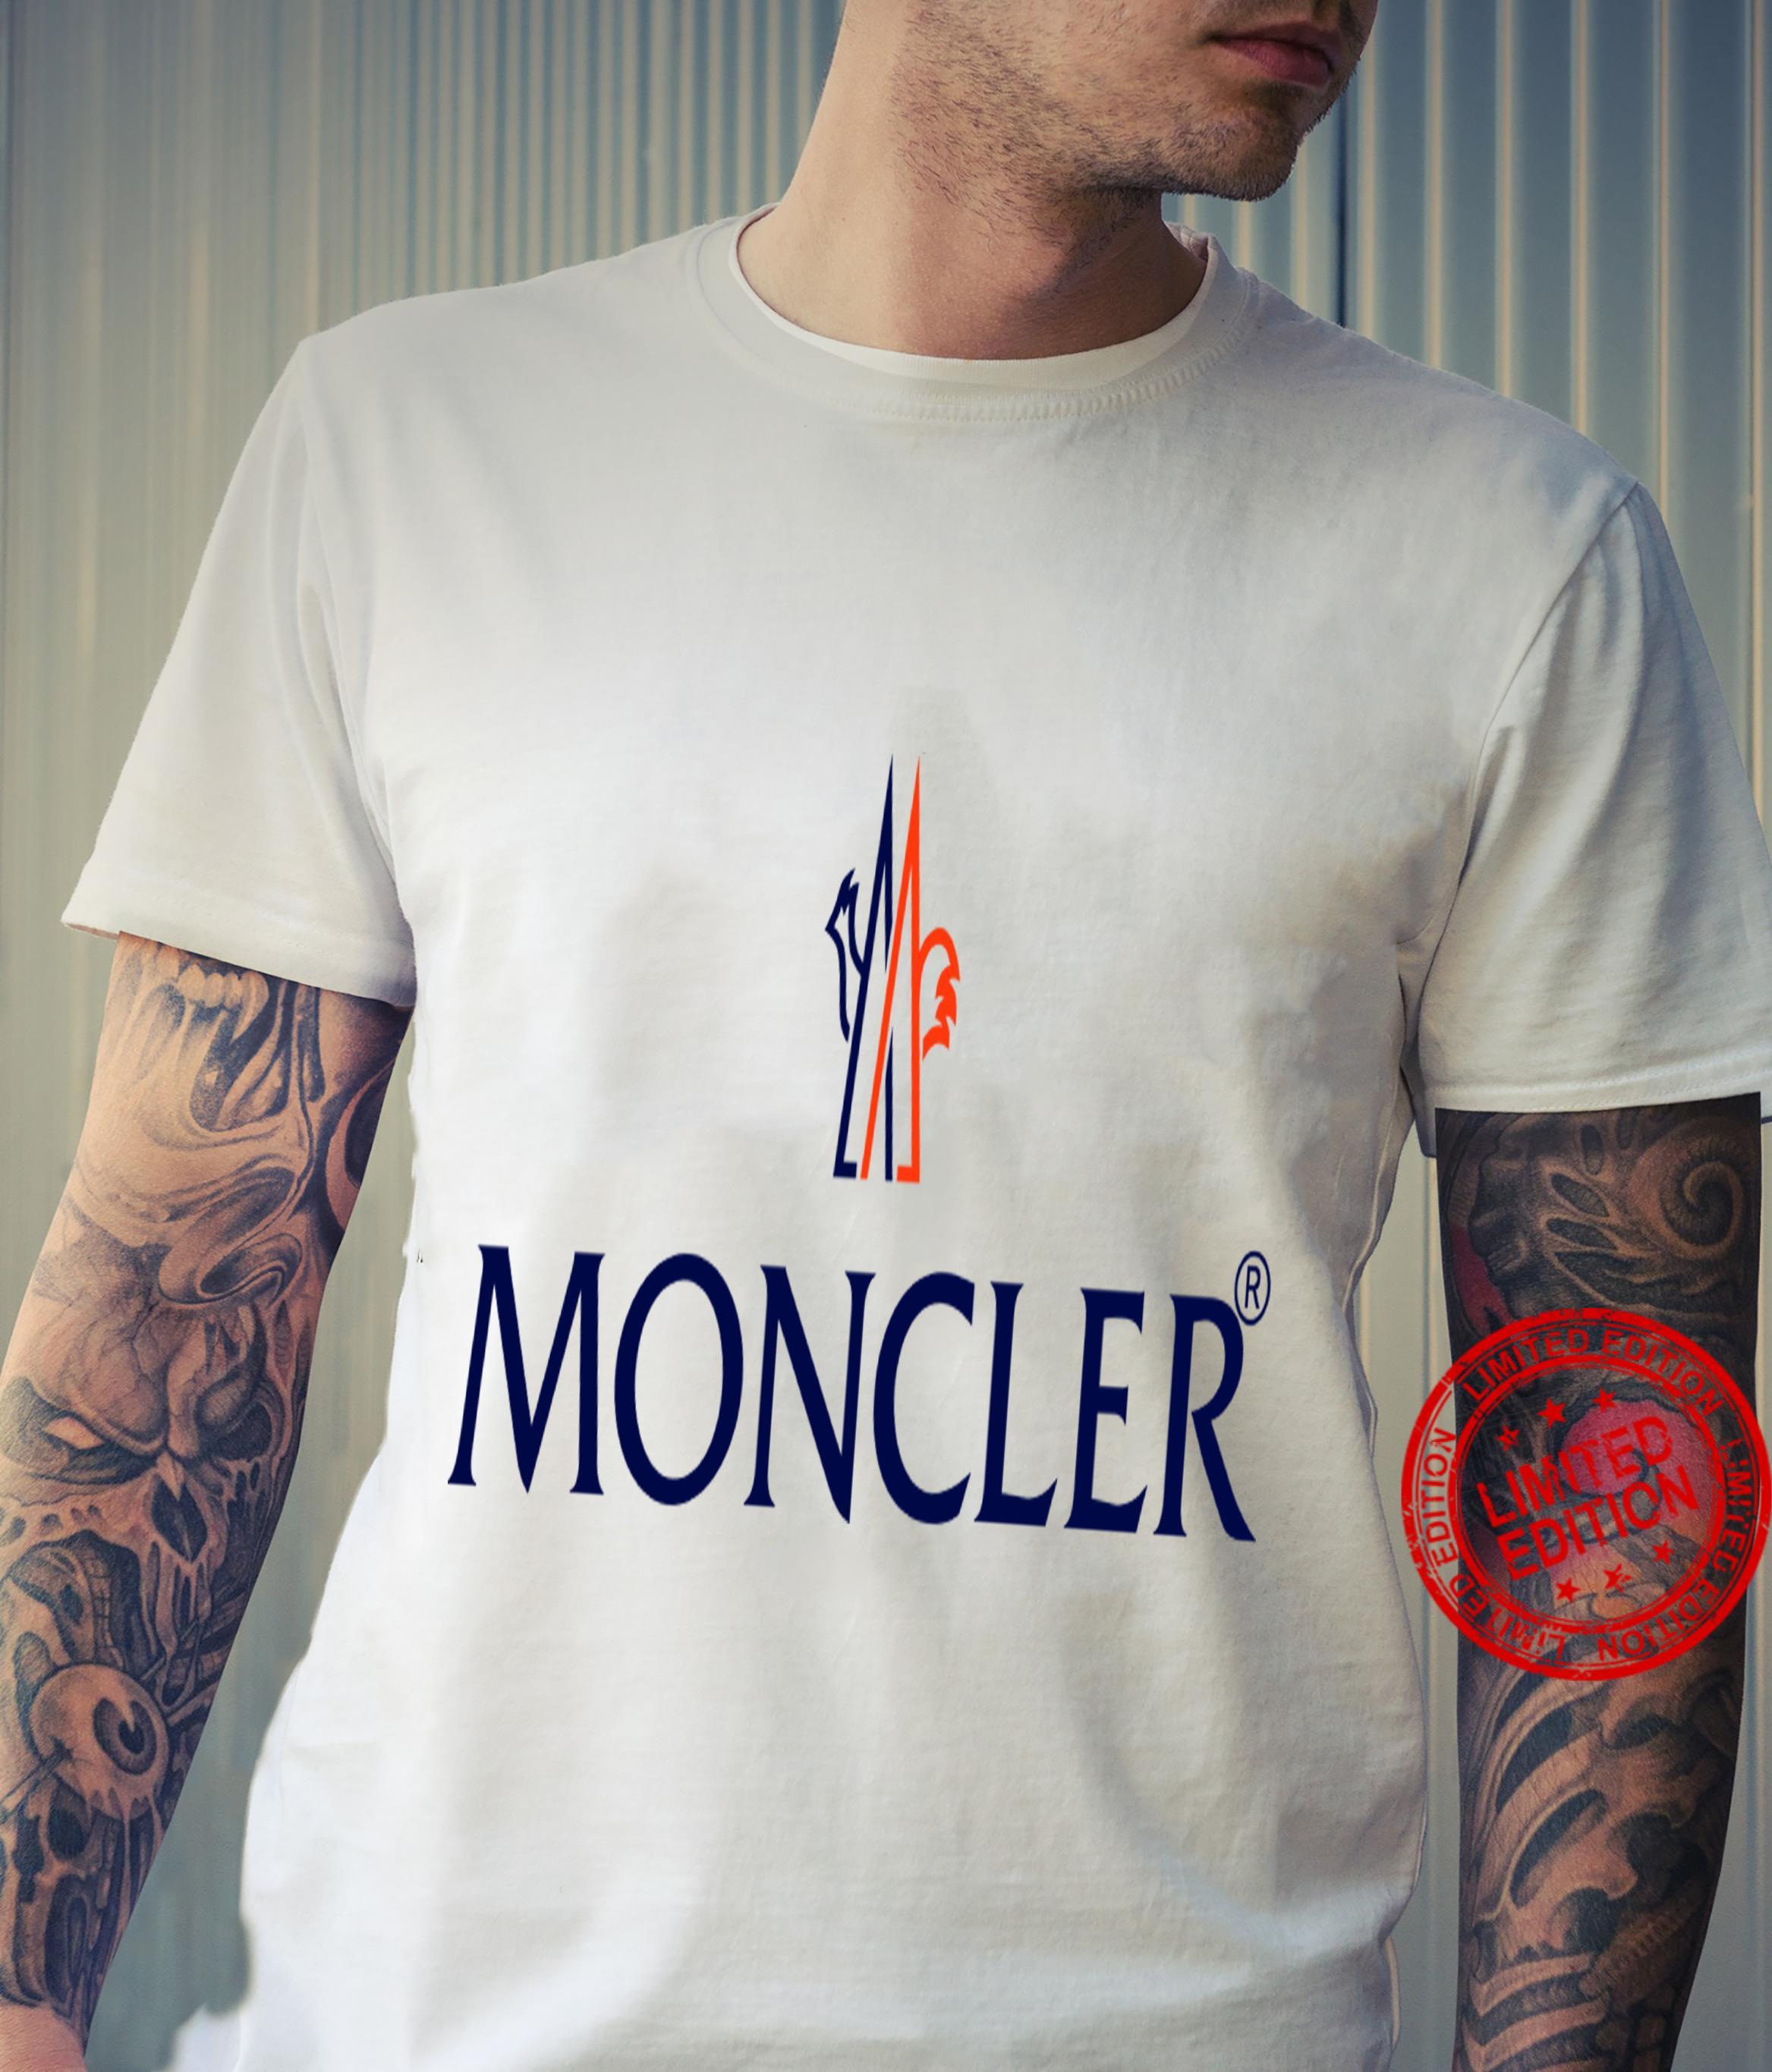 Moncler logo shirt